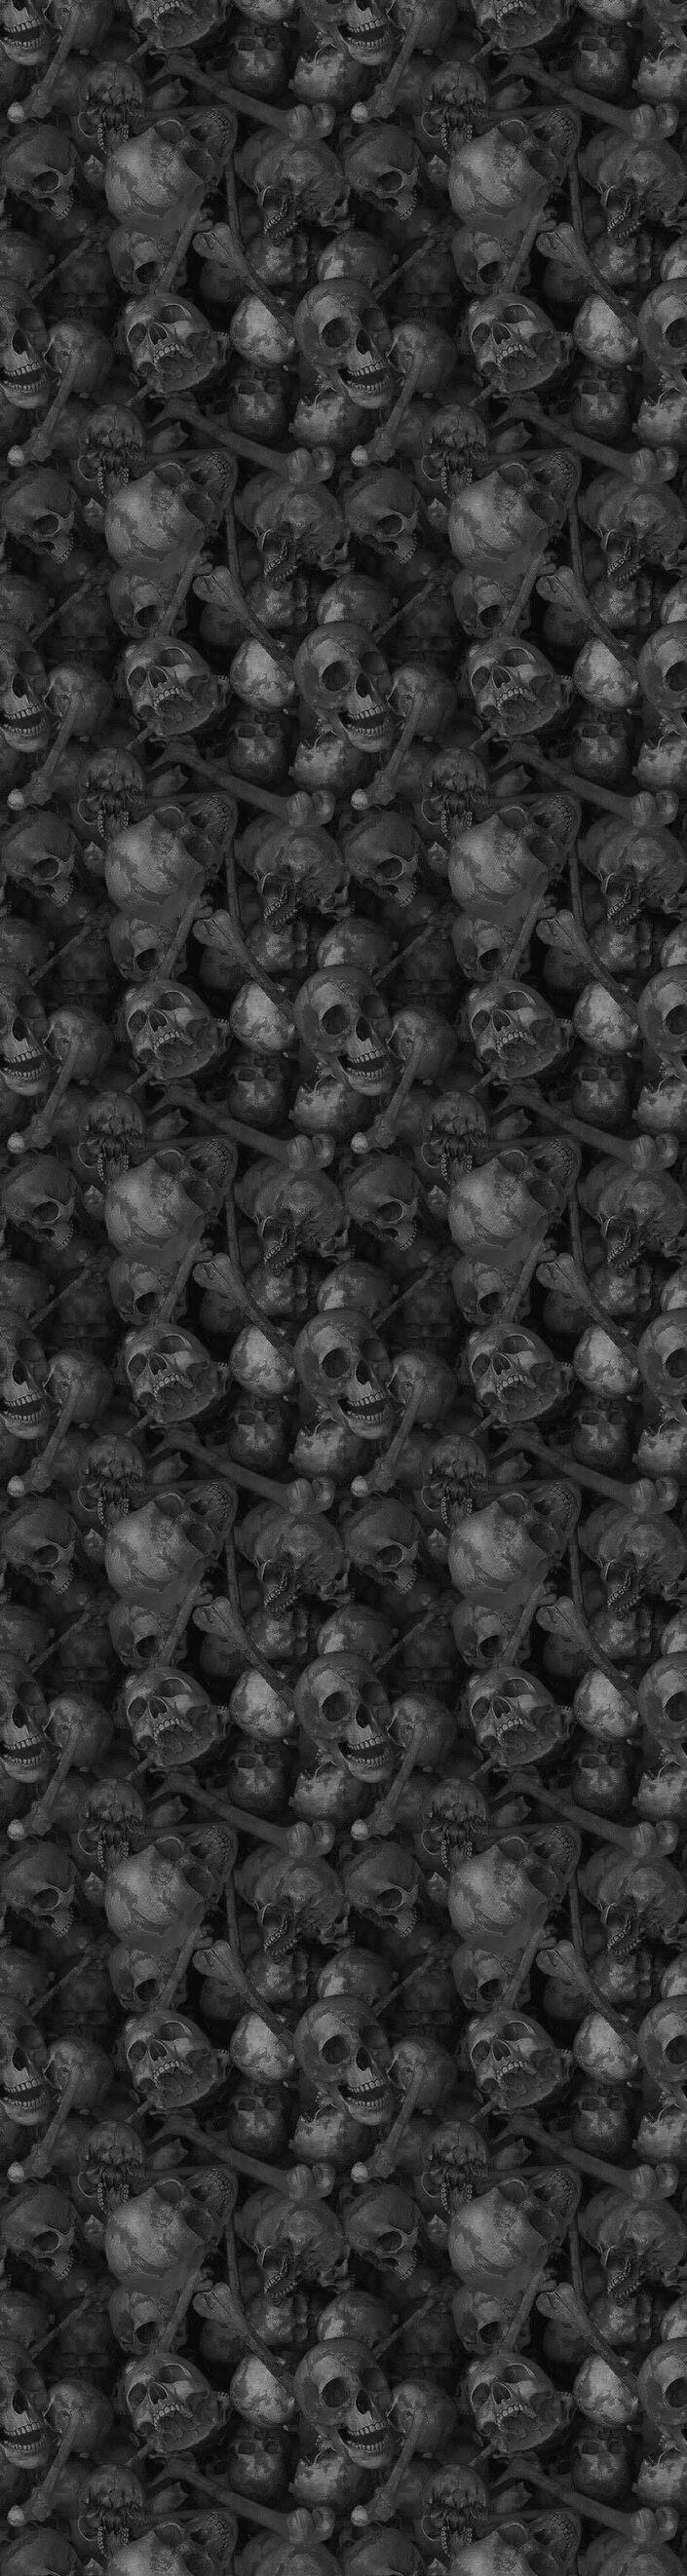 Skull Tile Gray Wikia Template